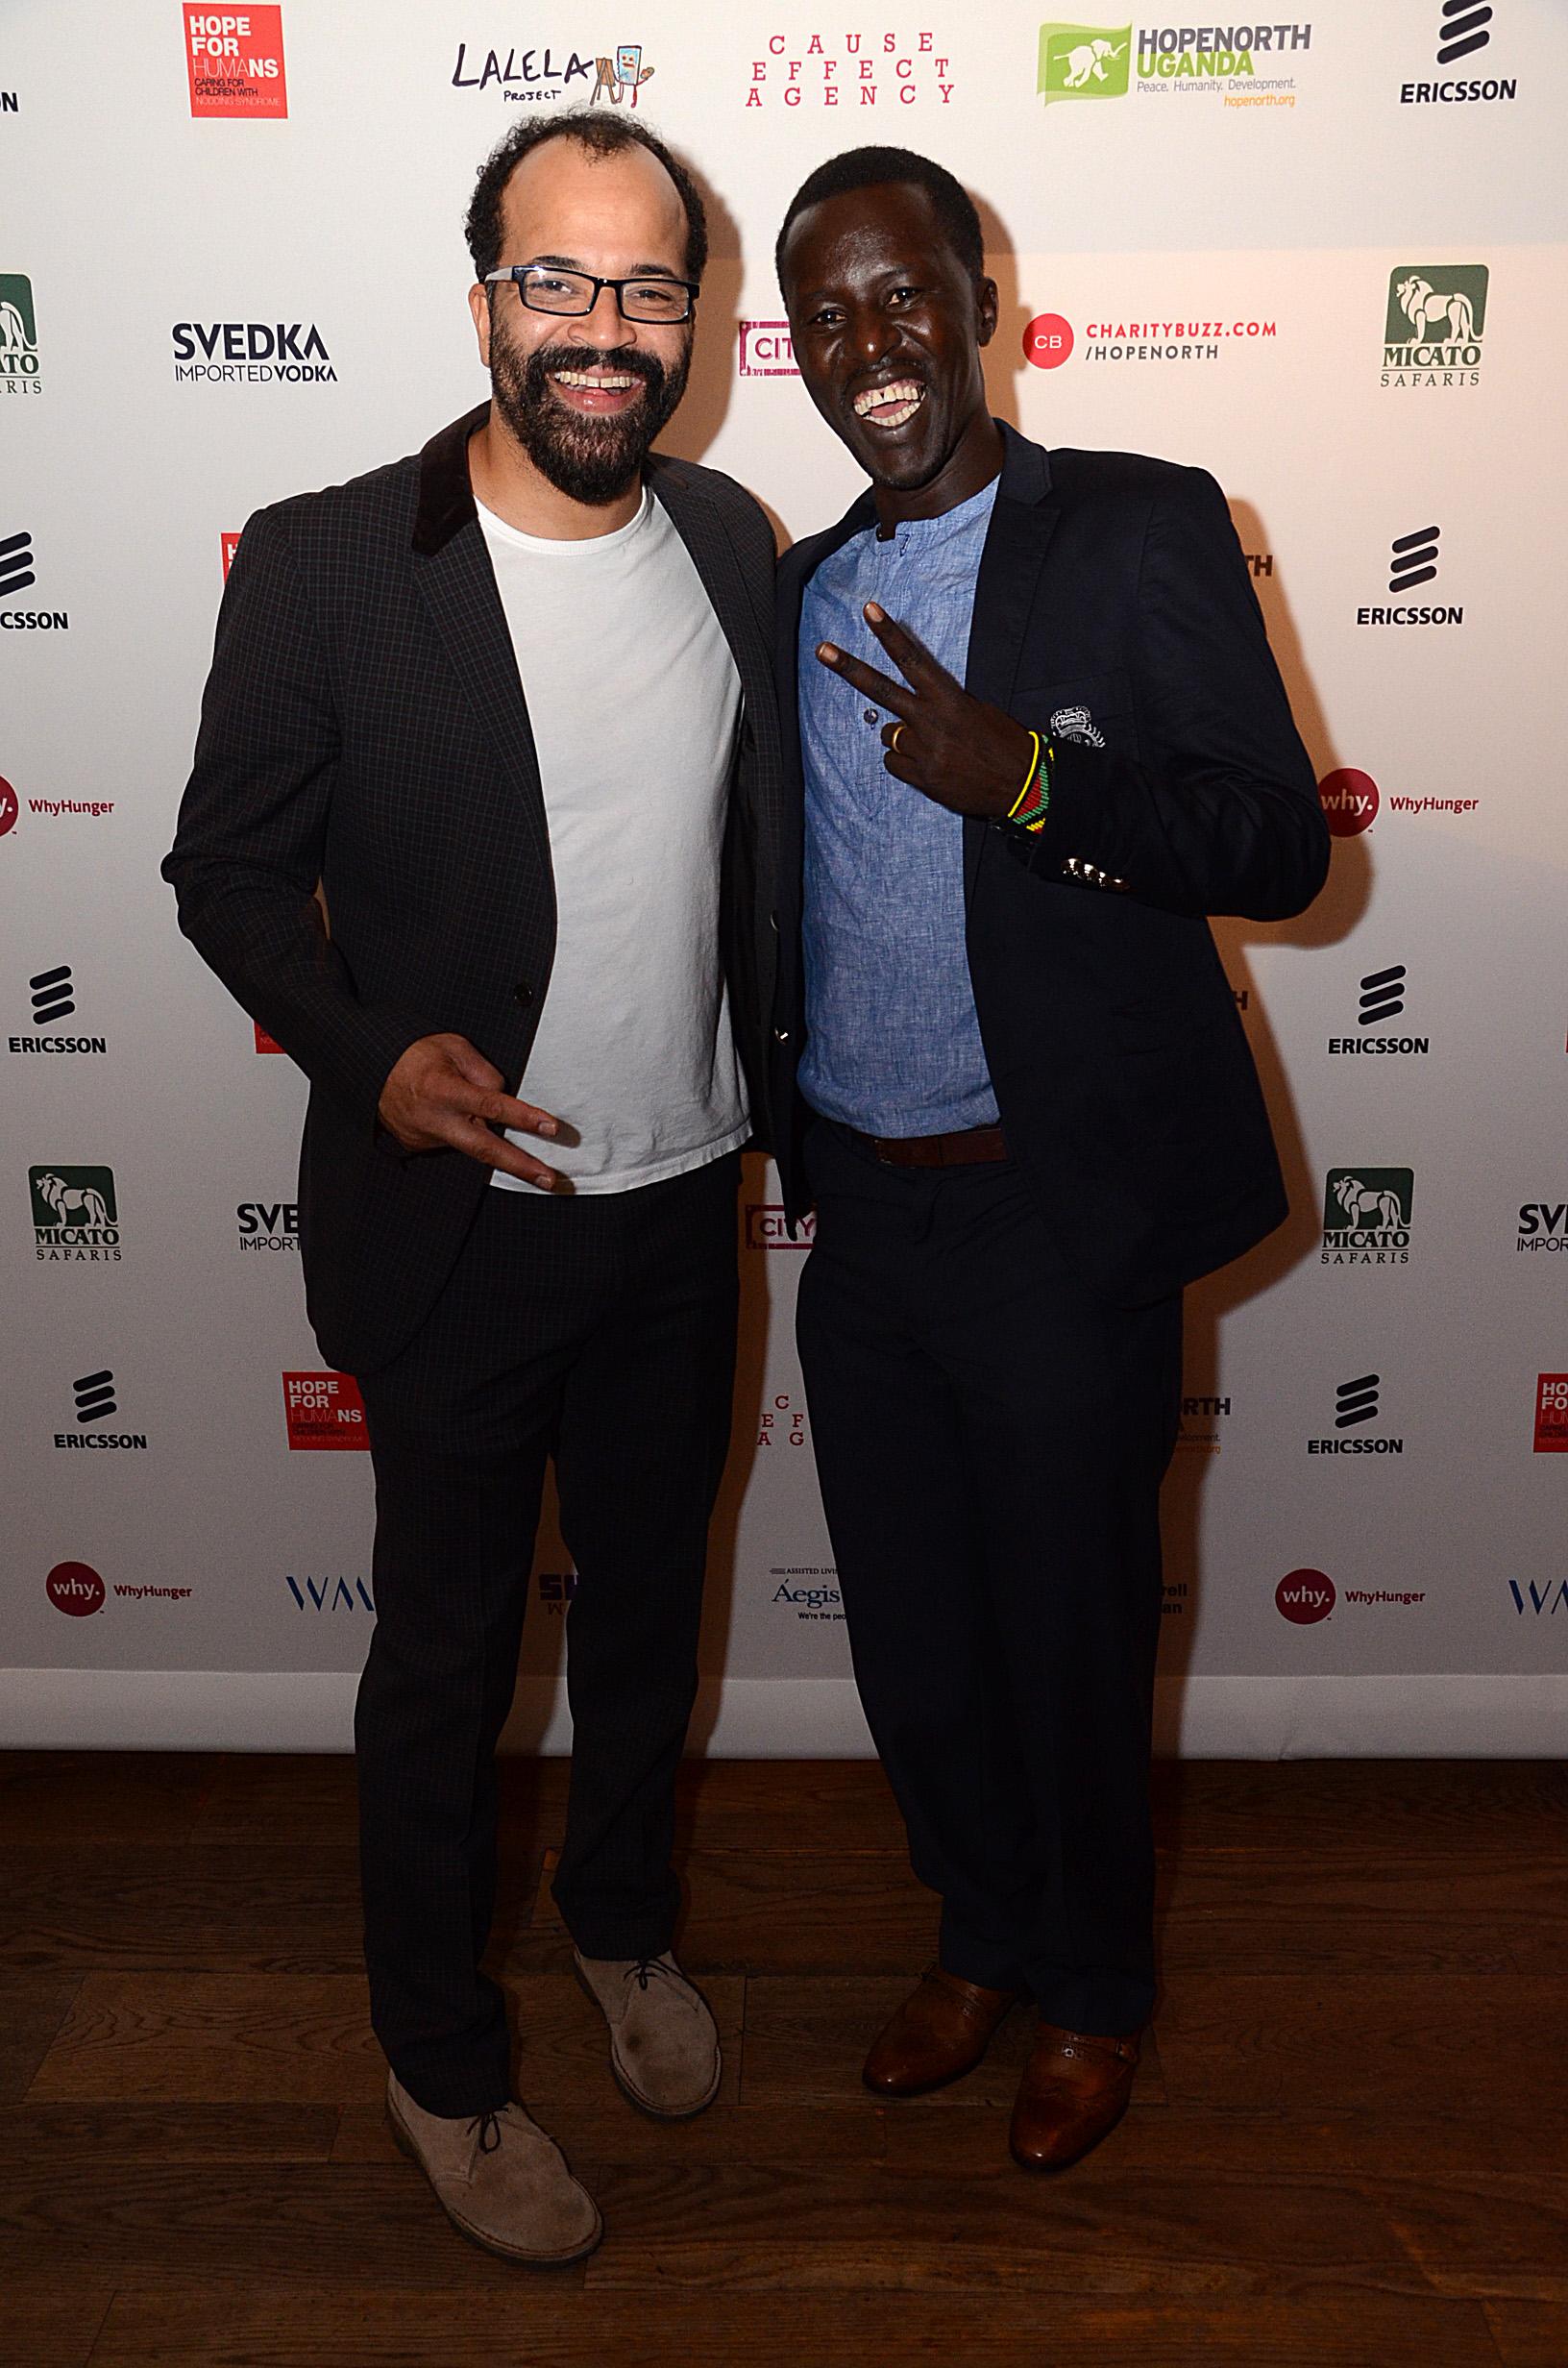 Jeffrey_Wright&Okello- photo by Andrew Werner, 2168.jpg